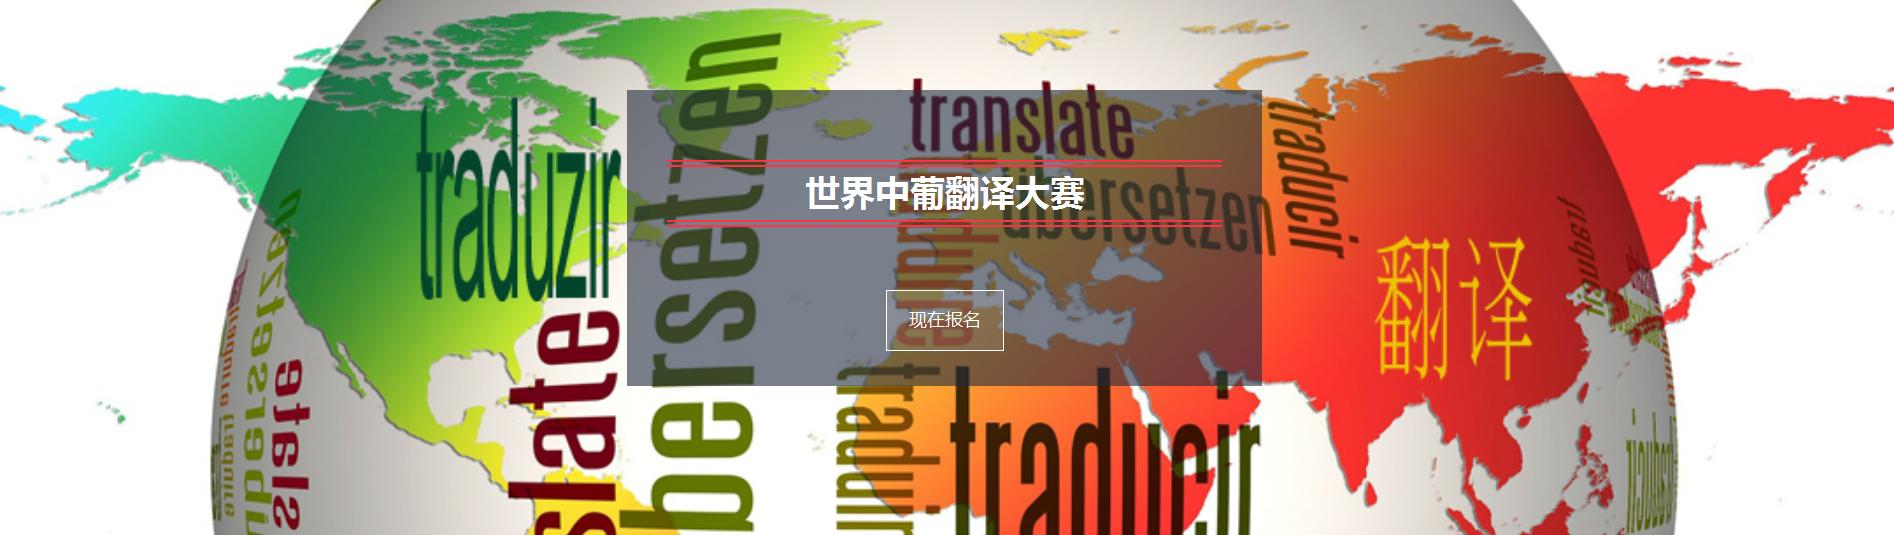 翻译比赛.png